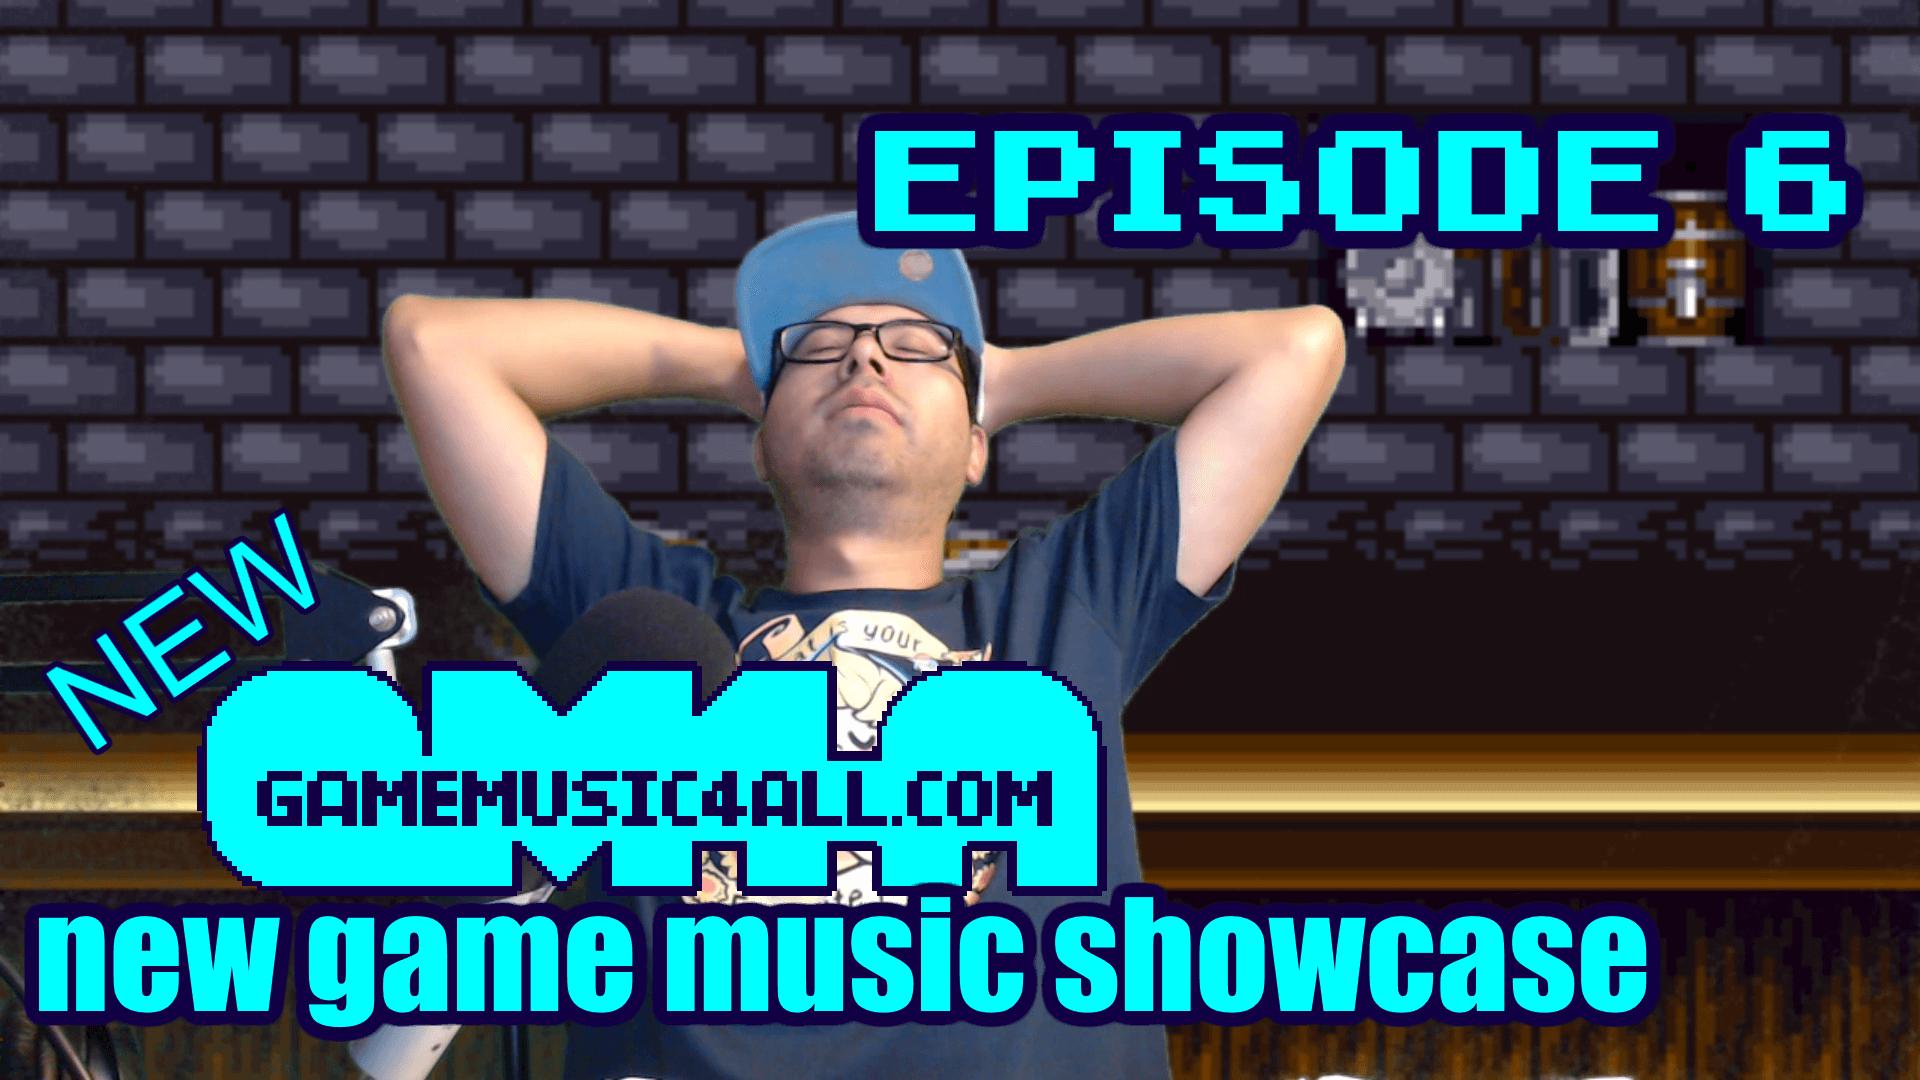 newgamemusicshowcase06.png